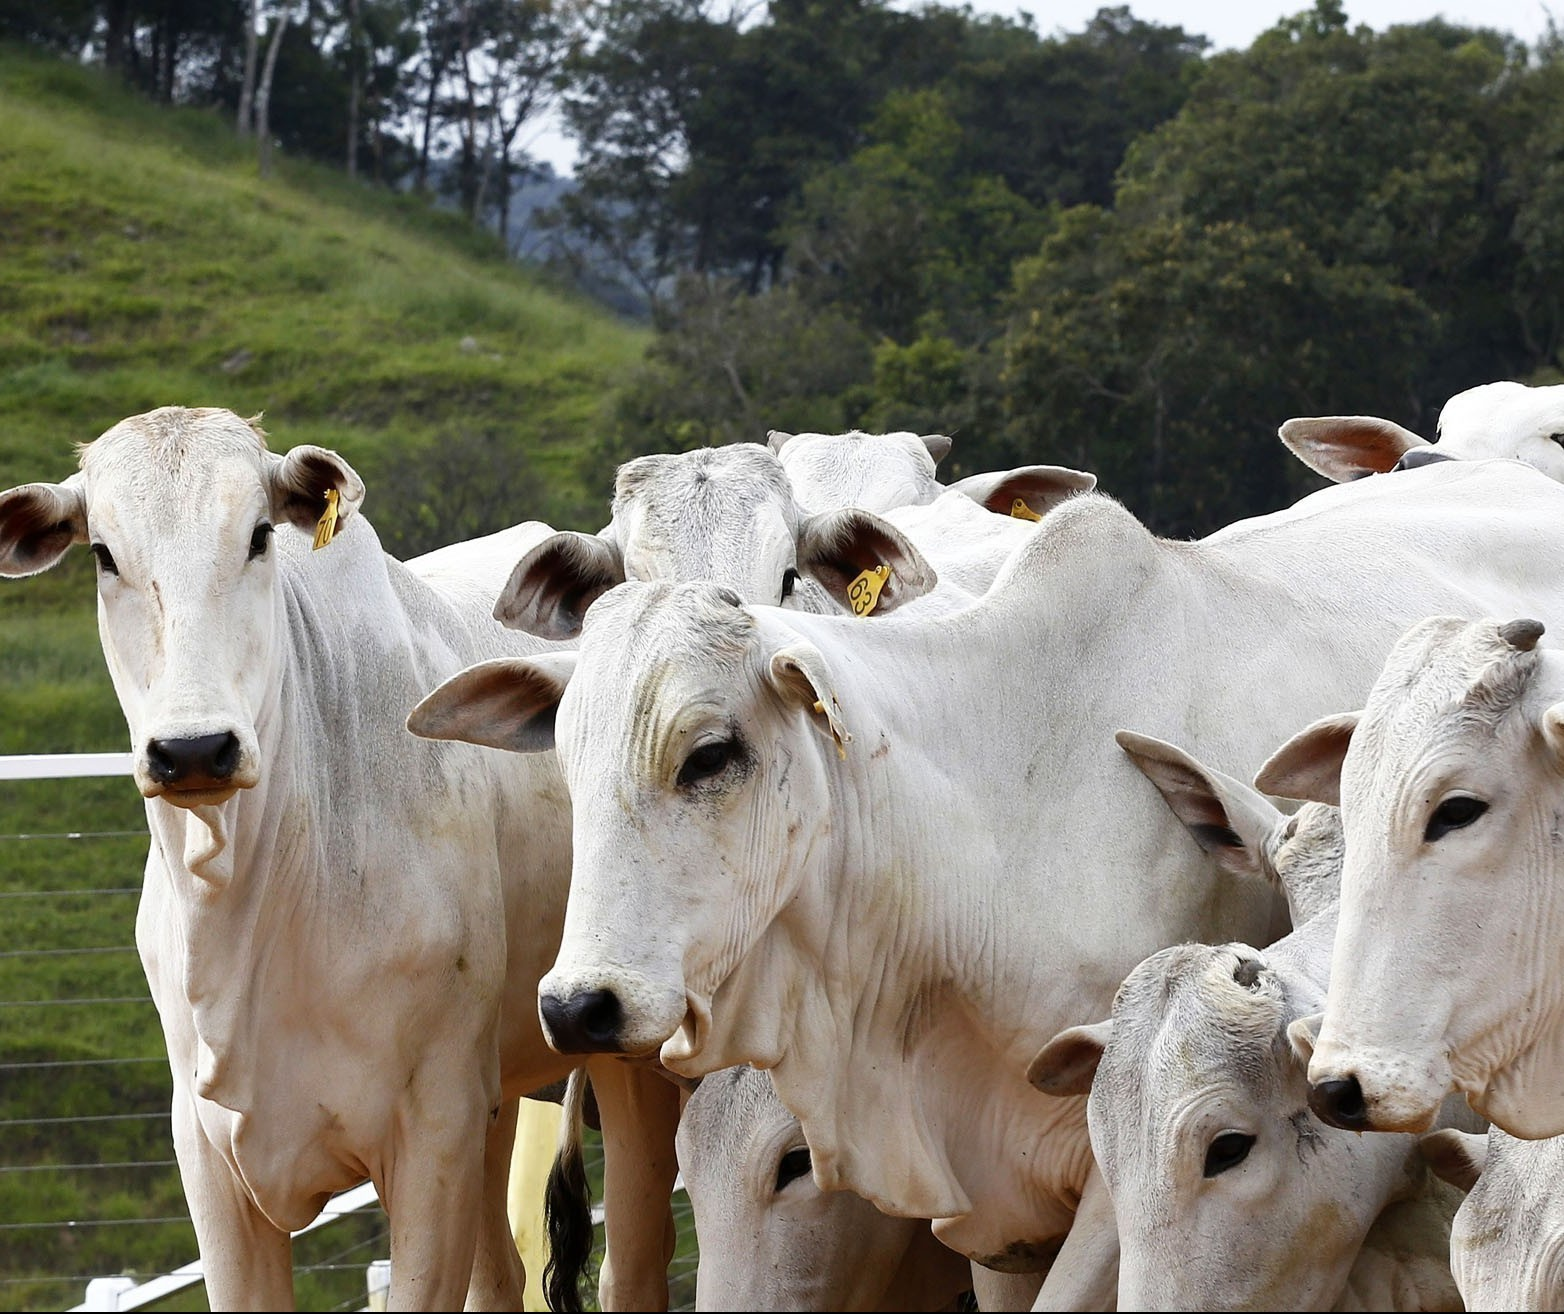 Boi gordo custa R$ 190 a arroba em Paranavaí